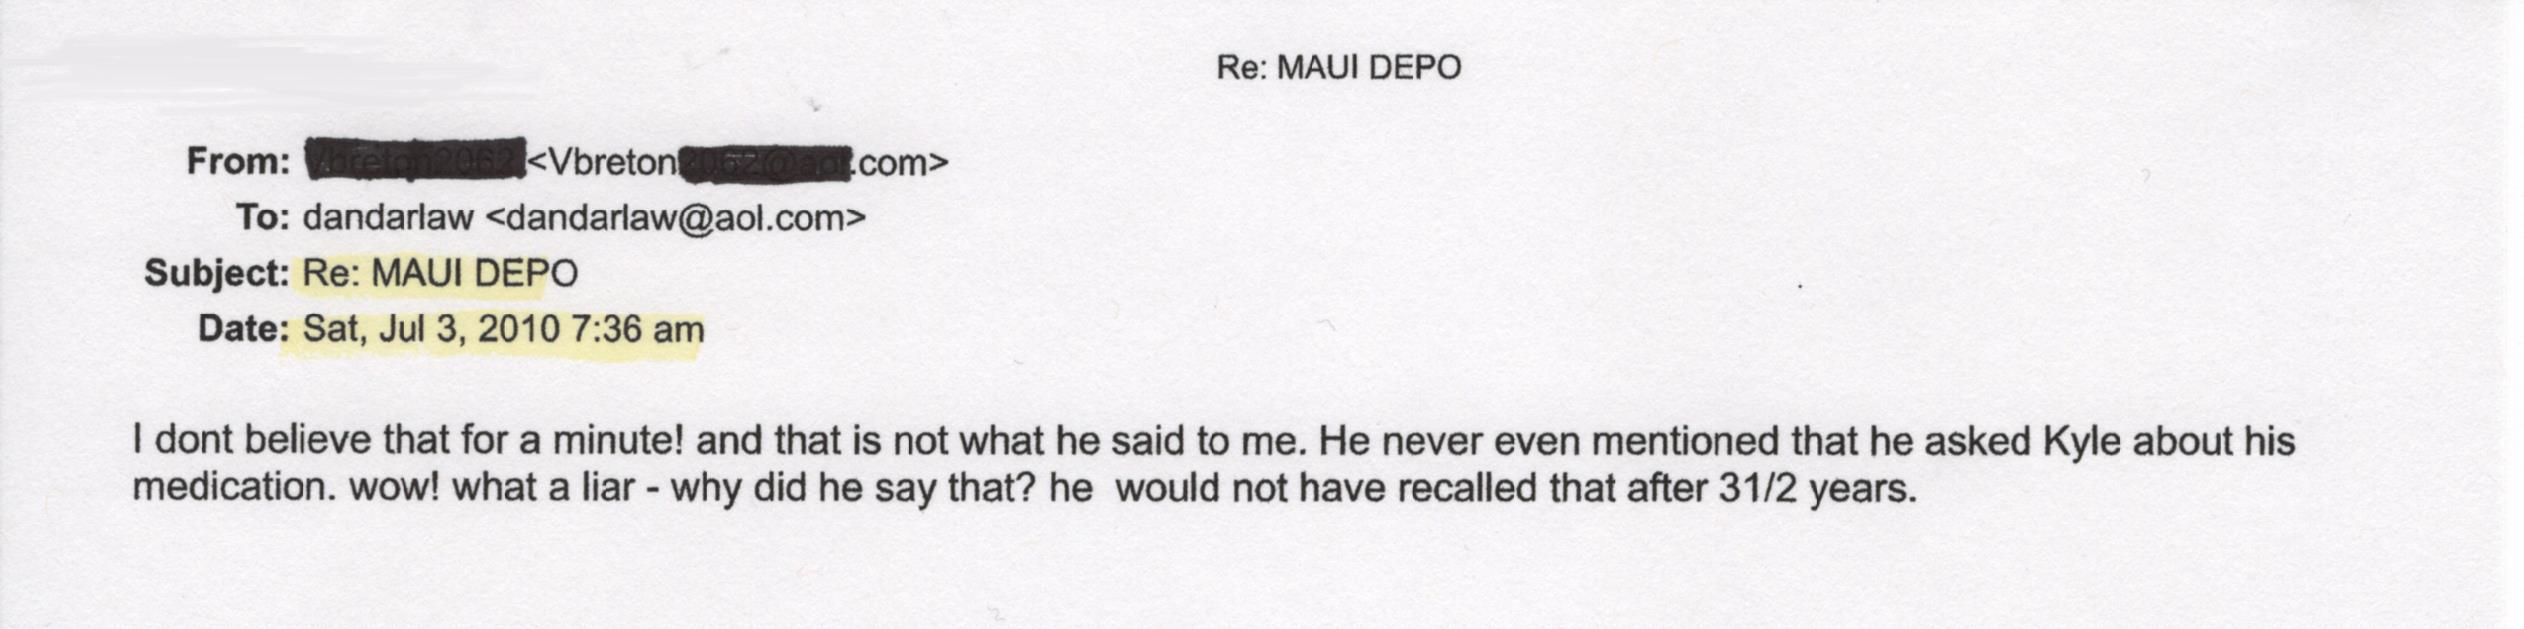 Maui Police Department, Silva, Corruption, Scientology 001